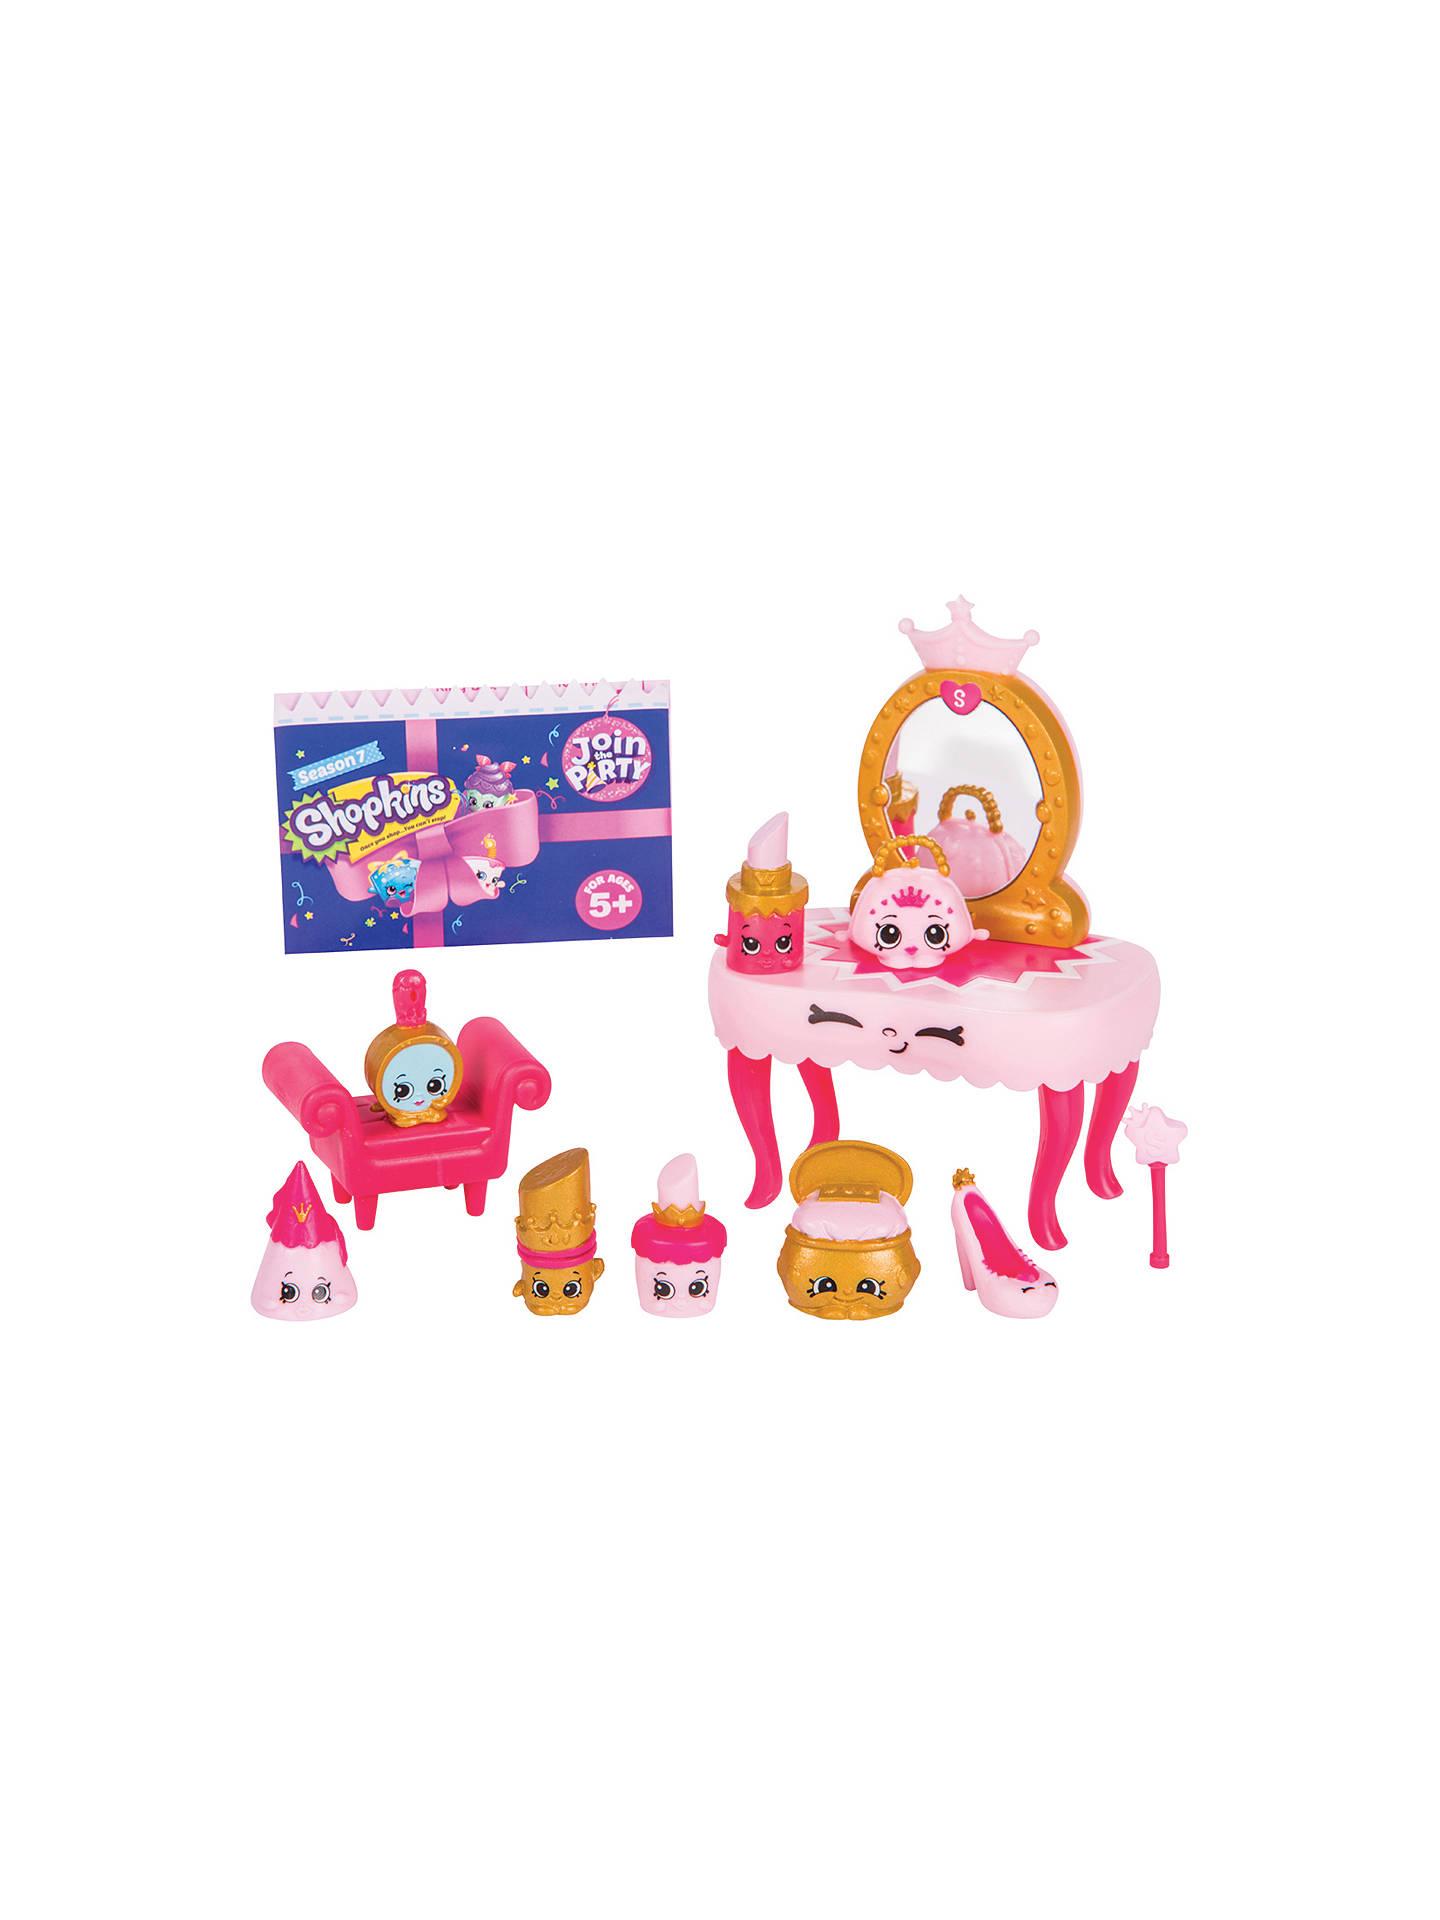 Shopkins season 7 princess party collection pack at john - John lewis shopkins ...